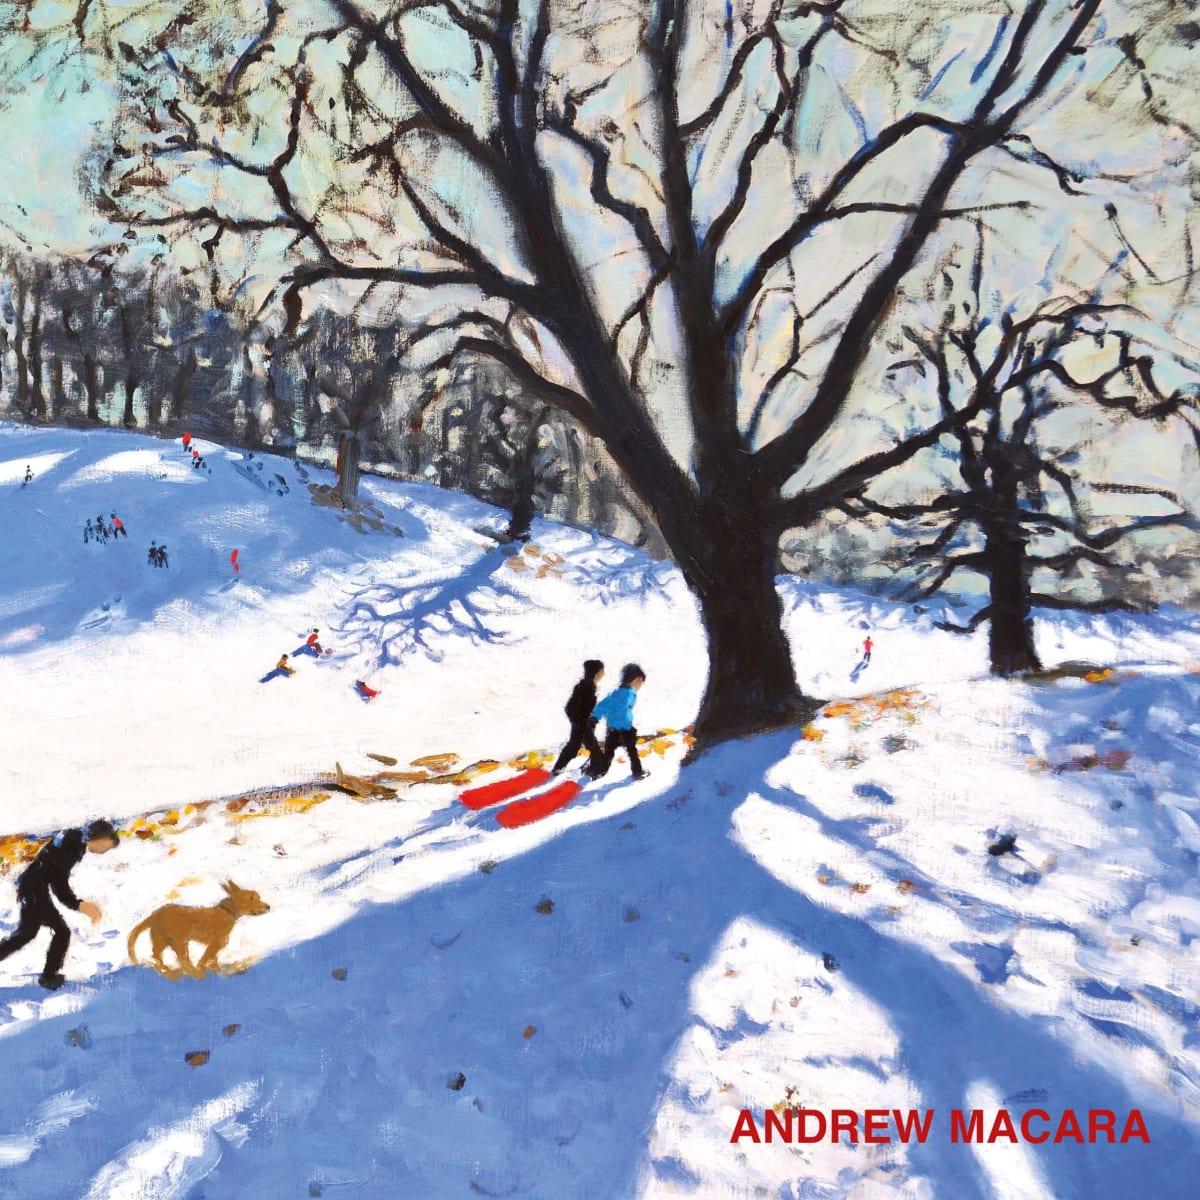 Andrew Macara: New Paintings